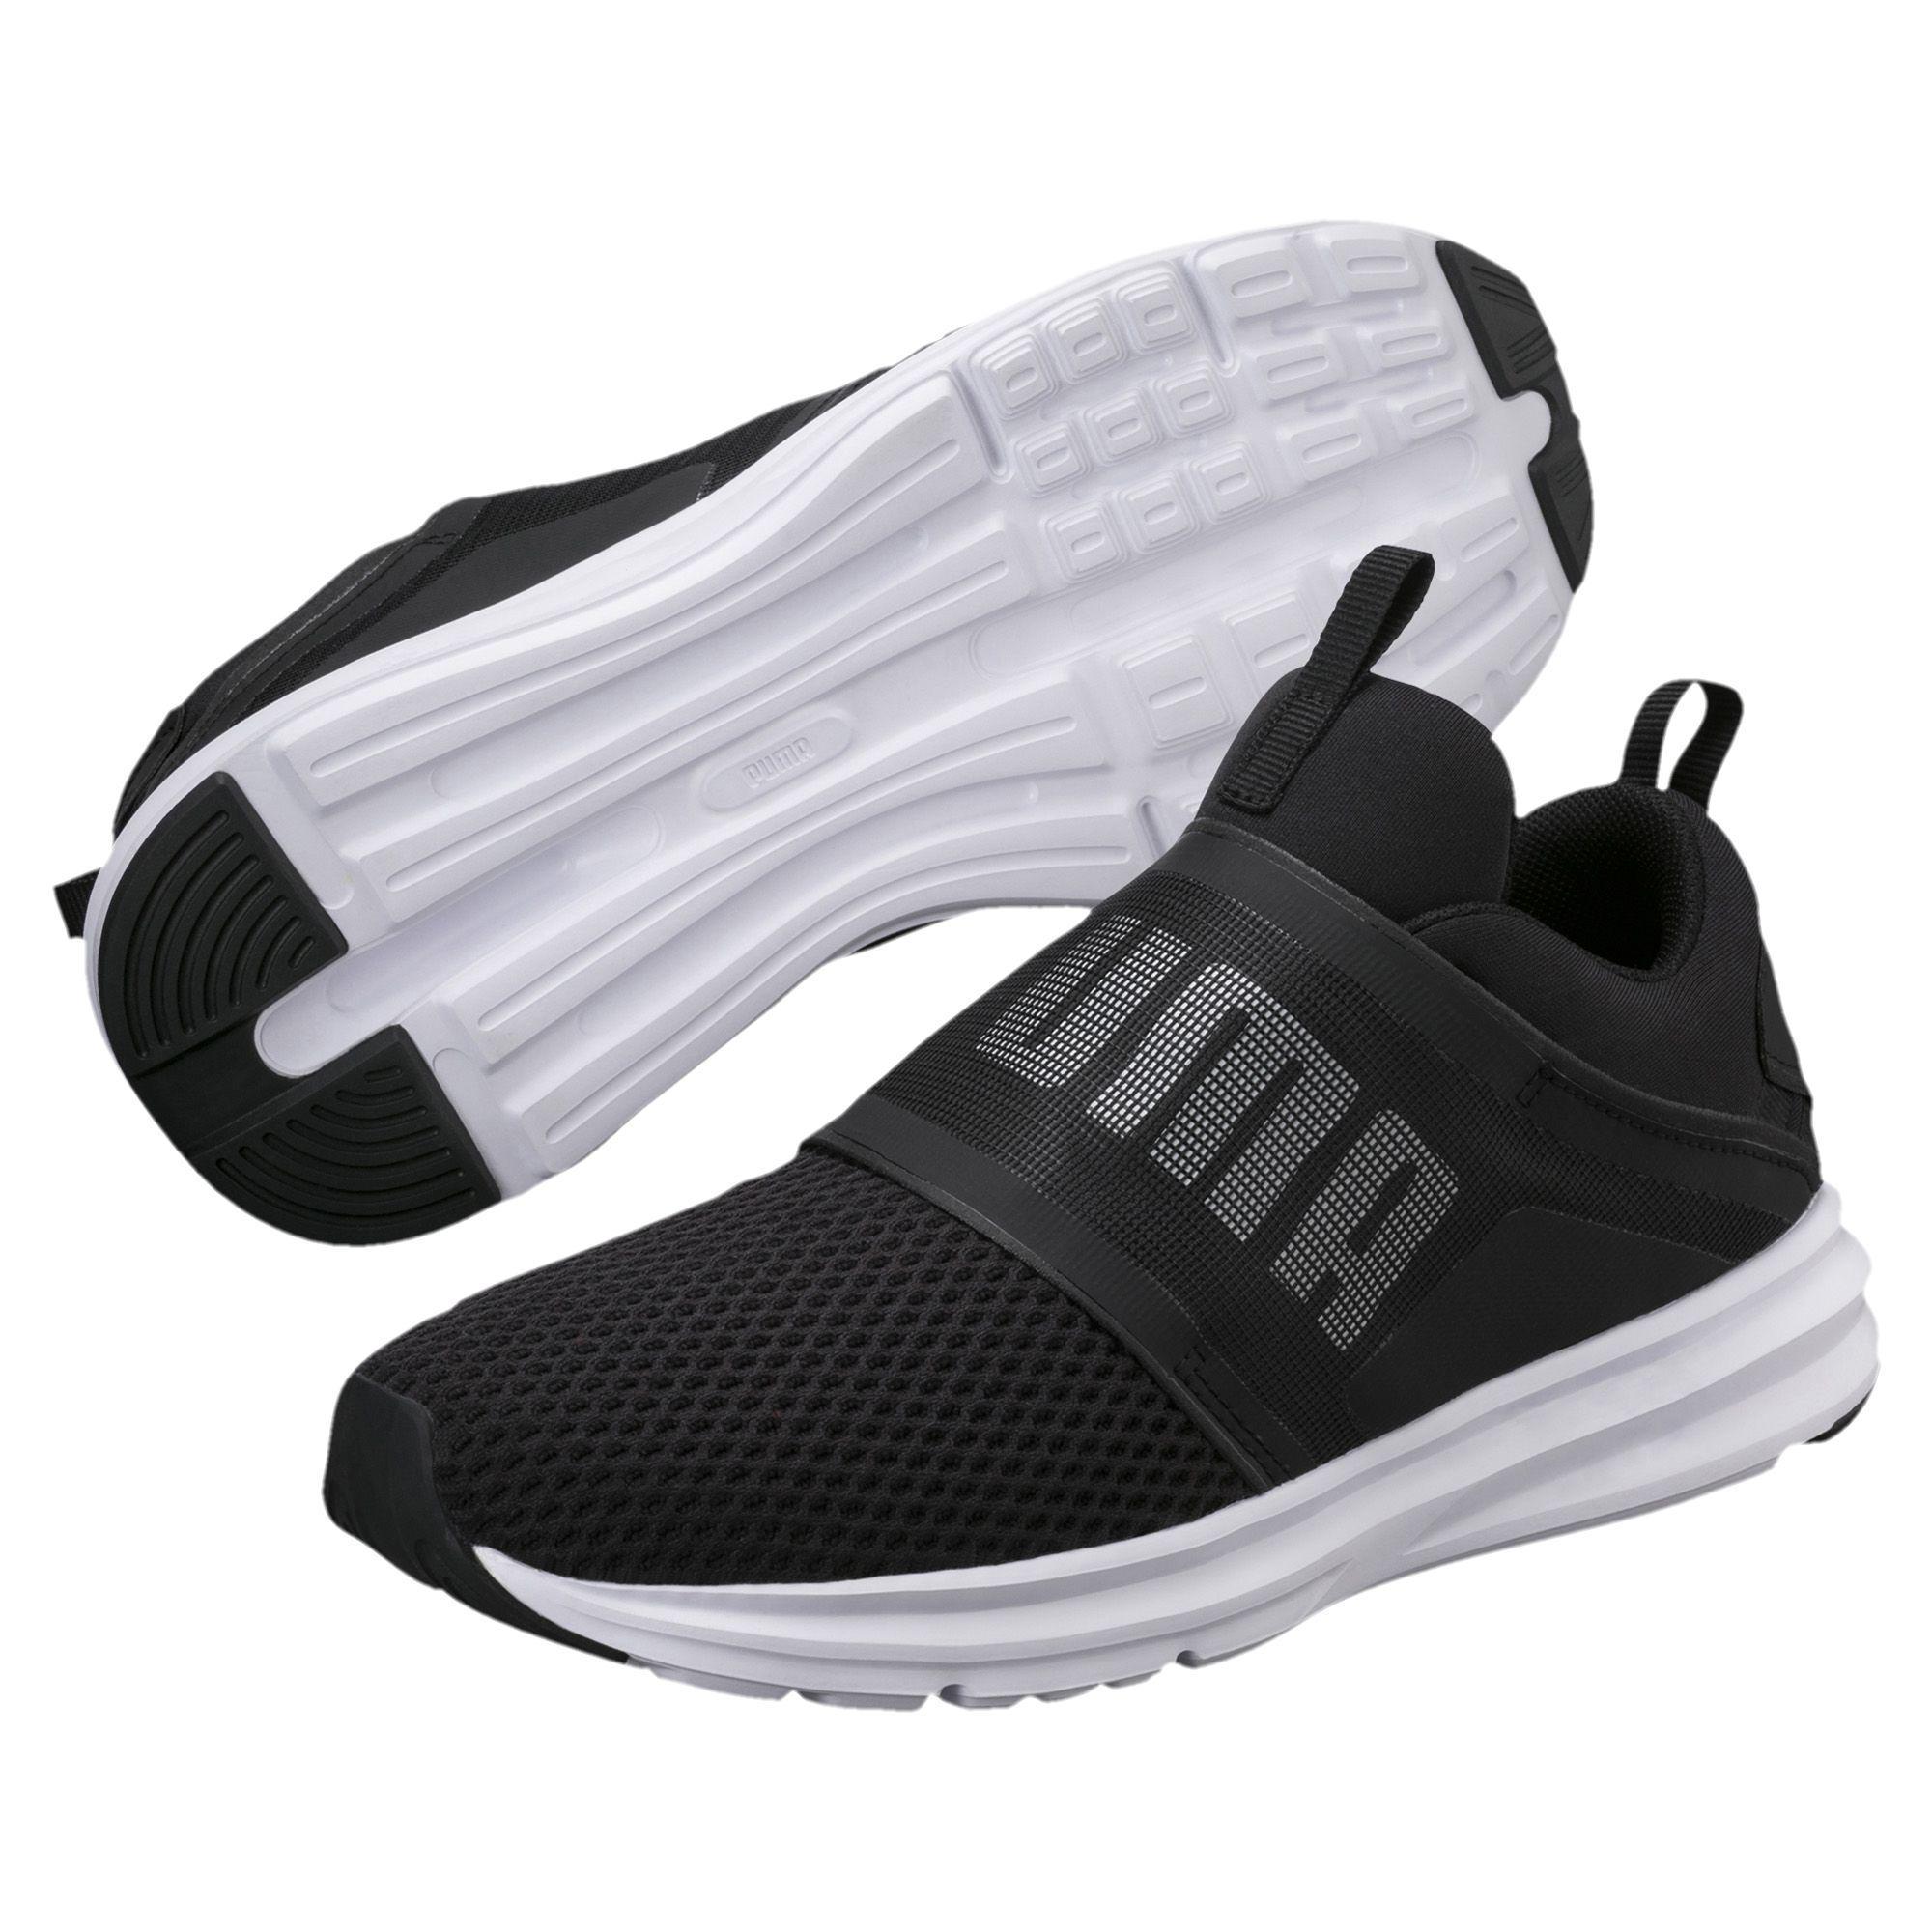 2ebd9f3ca022 Lyst - PUMA Enzo Strap Women s Running Shoes in Black